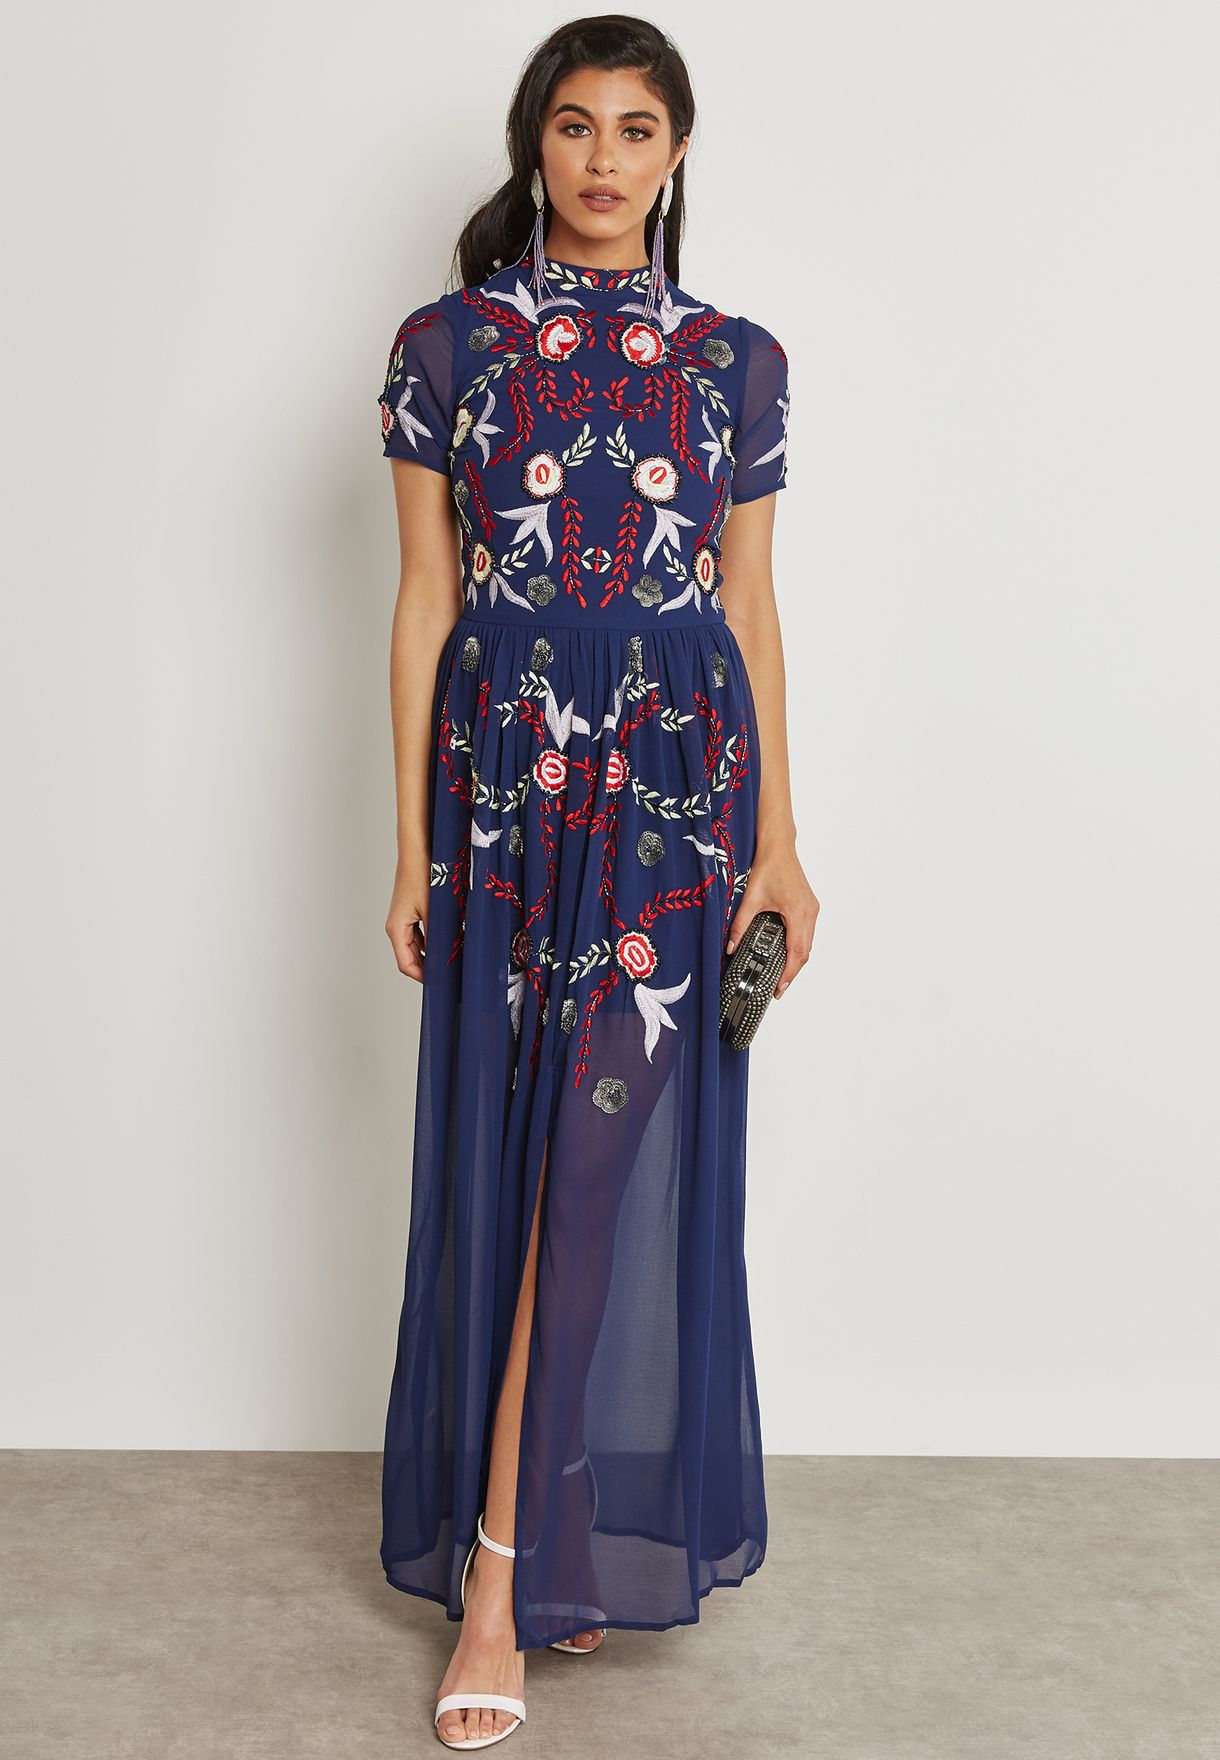 Embroidered Mesh Skirt Dress